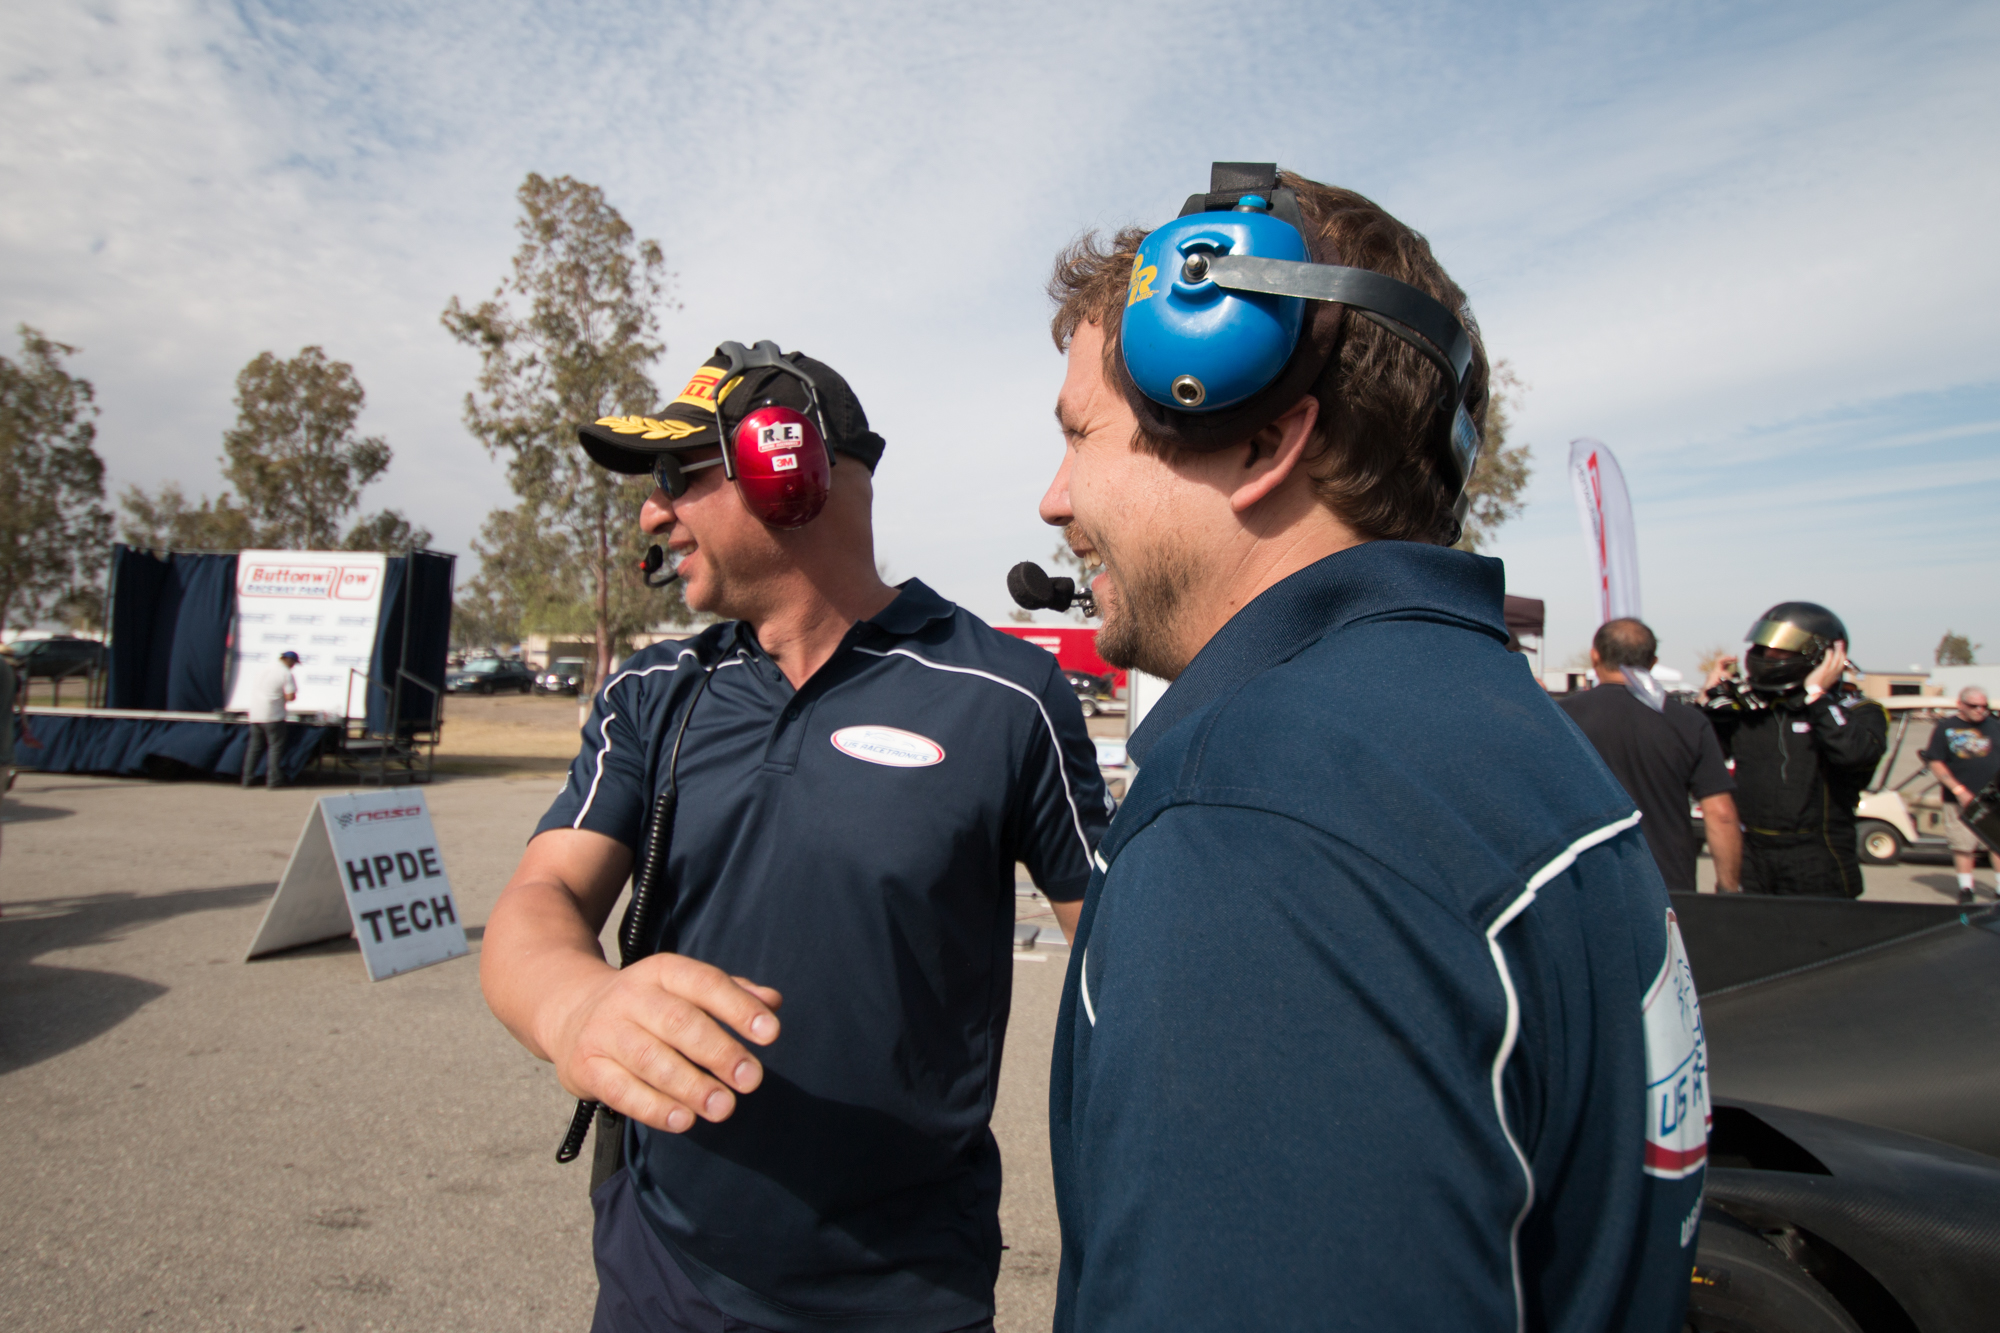 Steven-Racing-20130301-55557.jpg